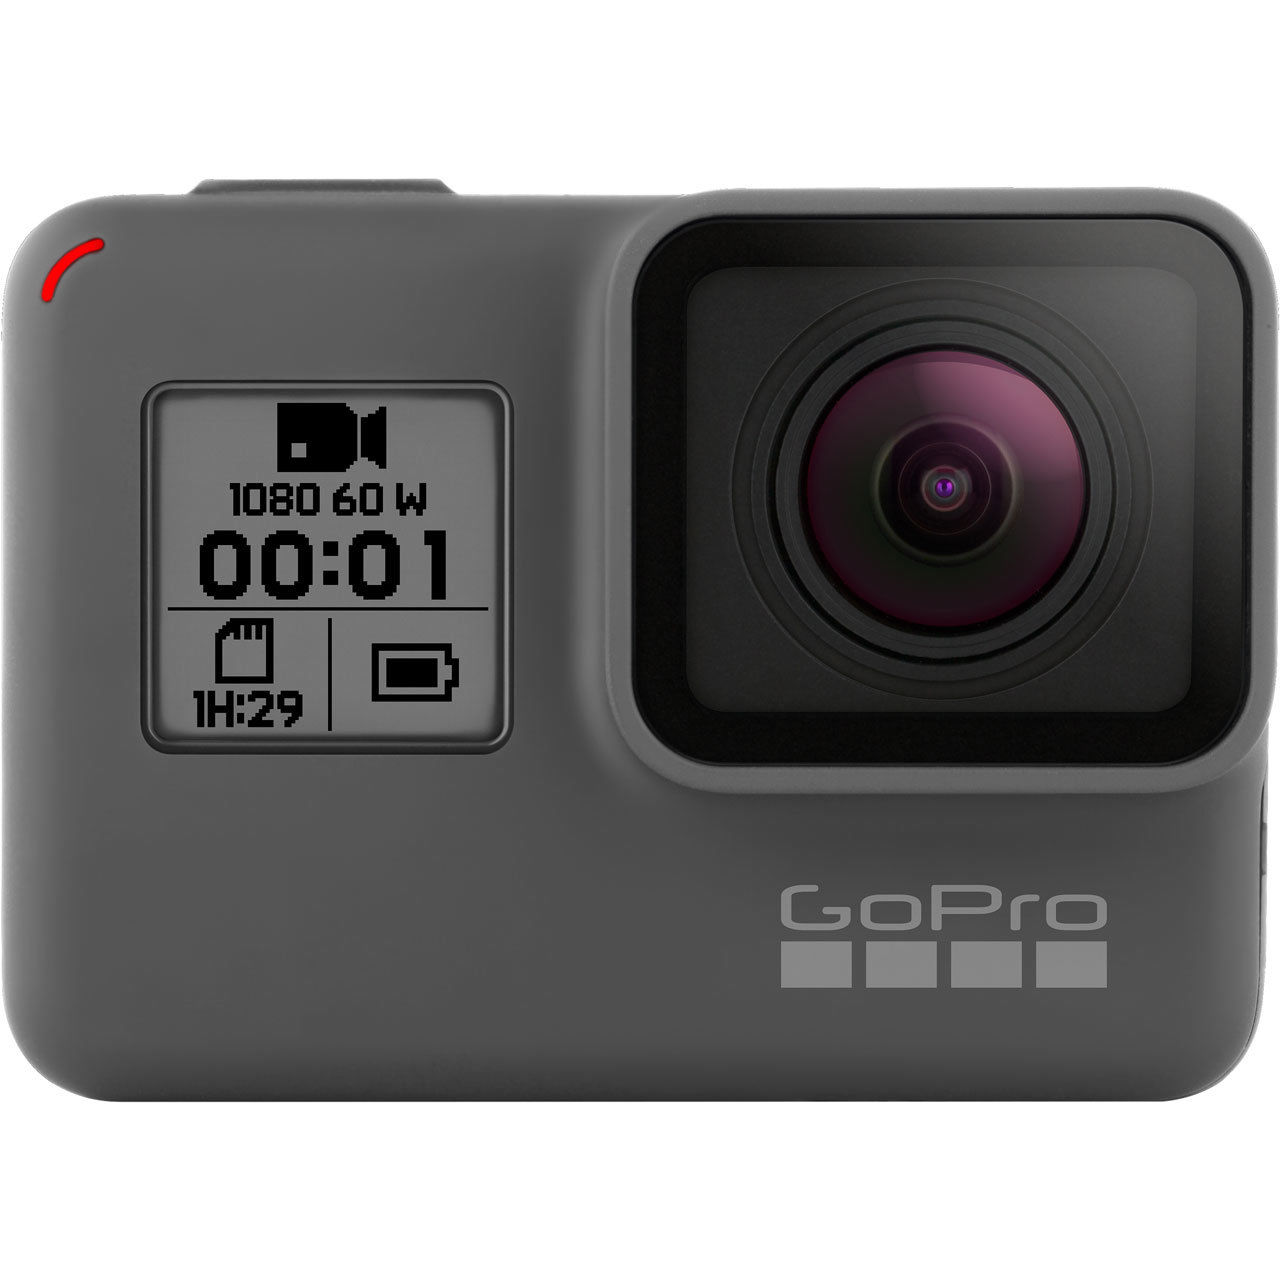 GoPro CHDHB-501 Hero Behavior Digital camera Black Latest